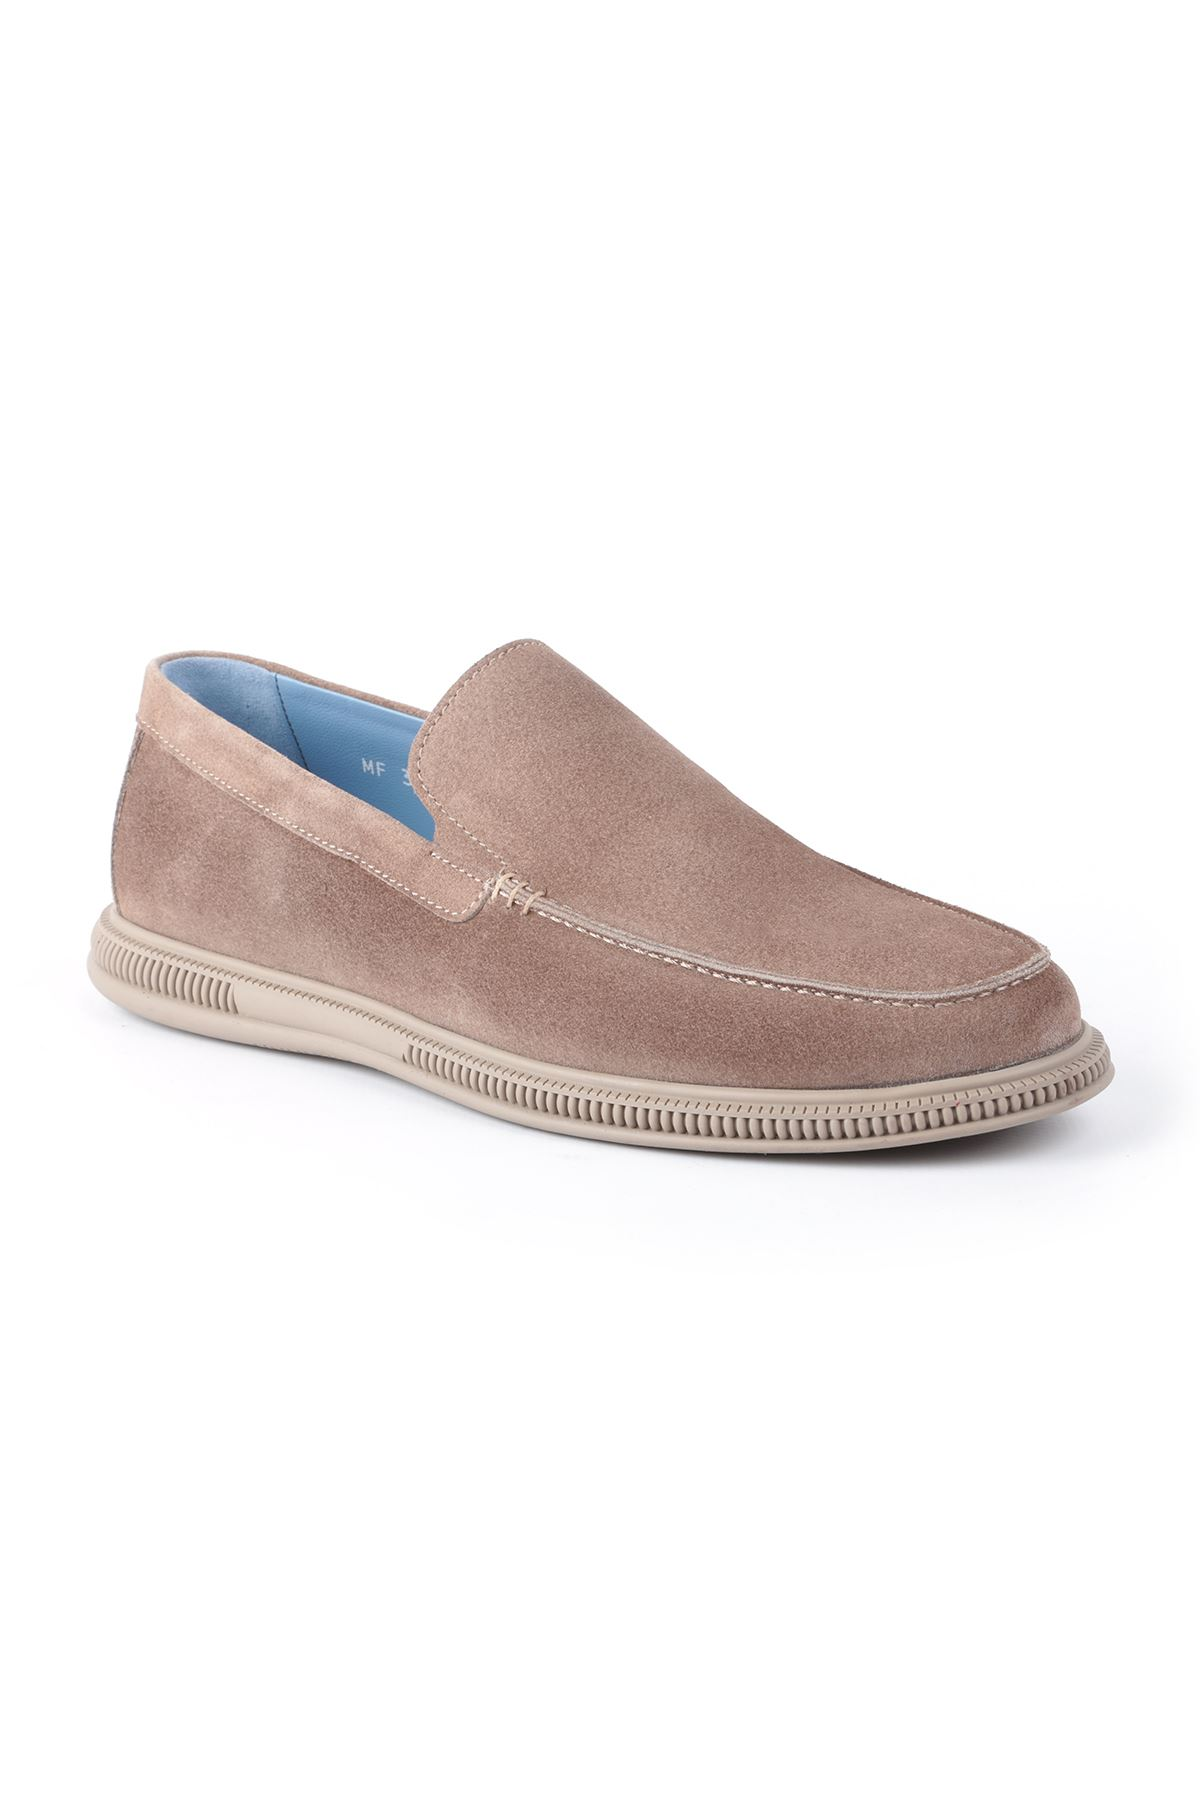 Libero L3635 Mink Loafer Men's Shoes